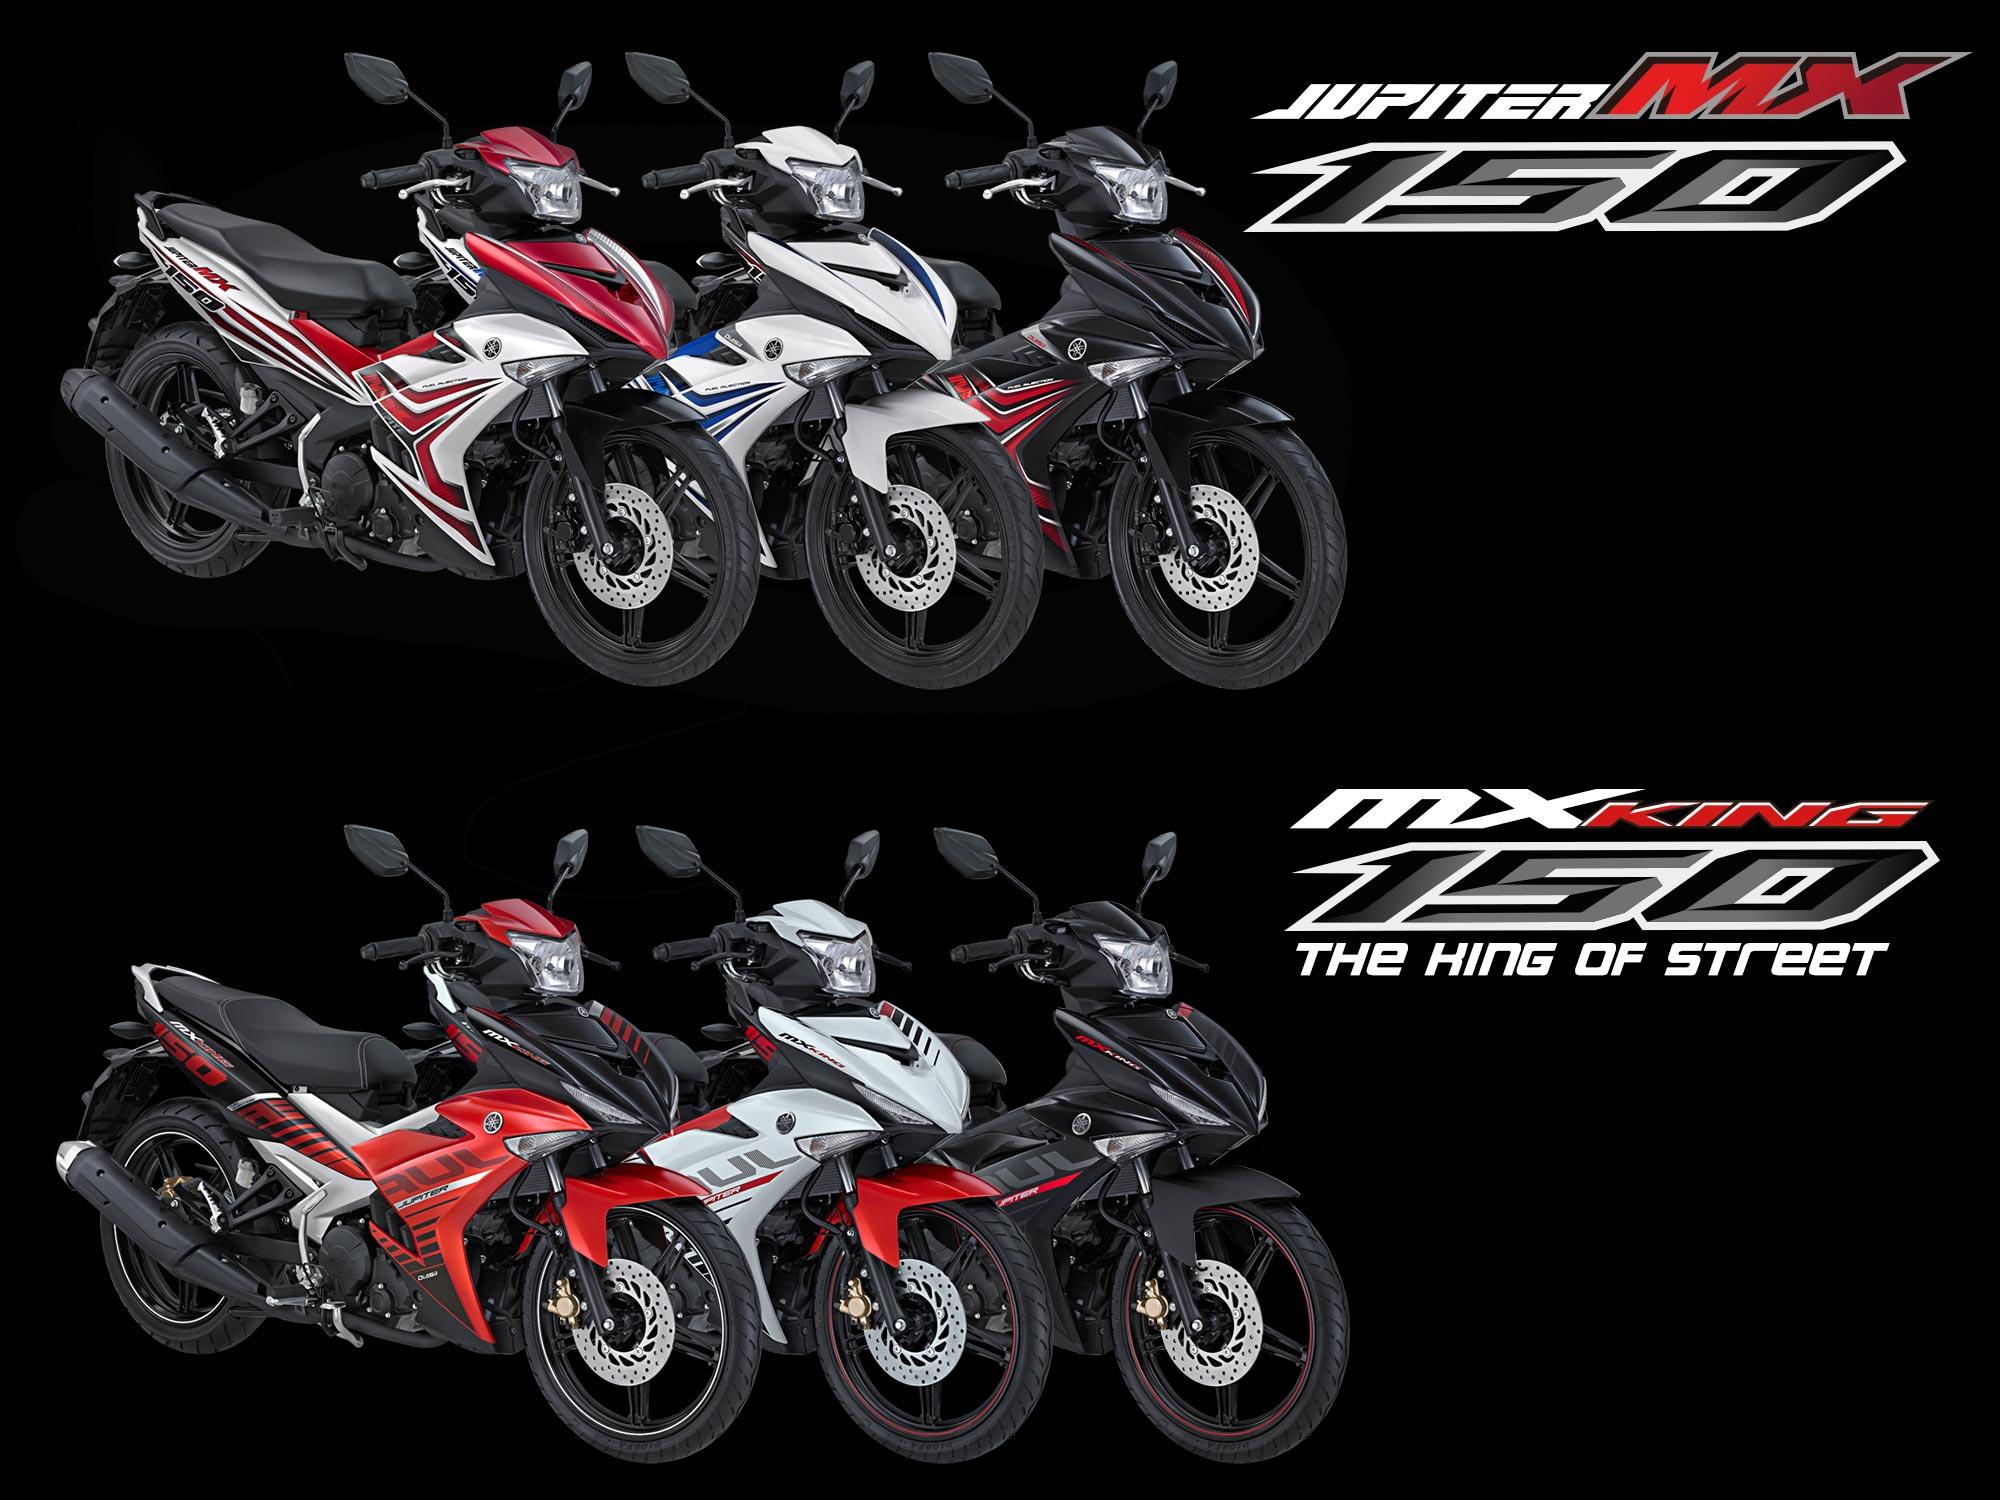 Yamaha Rilis Jupiter MX Dan MX KING Berikut Spesifikasi Harga